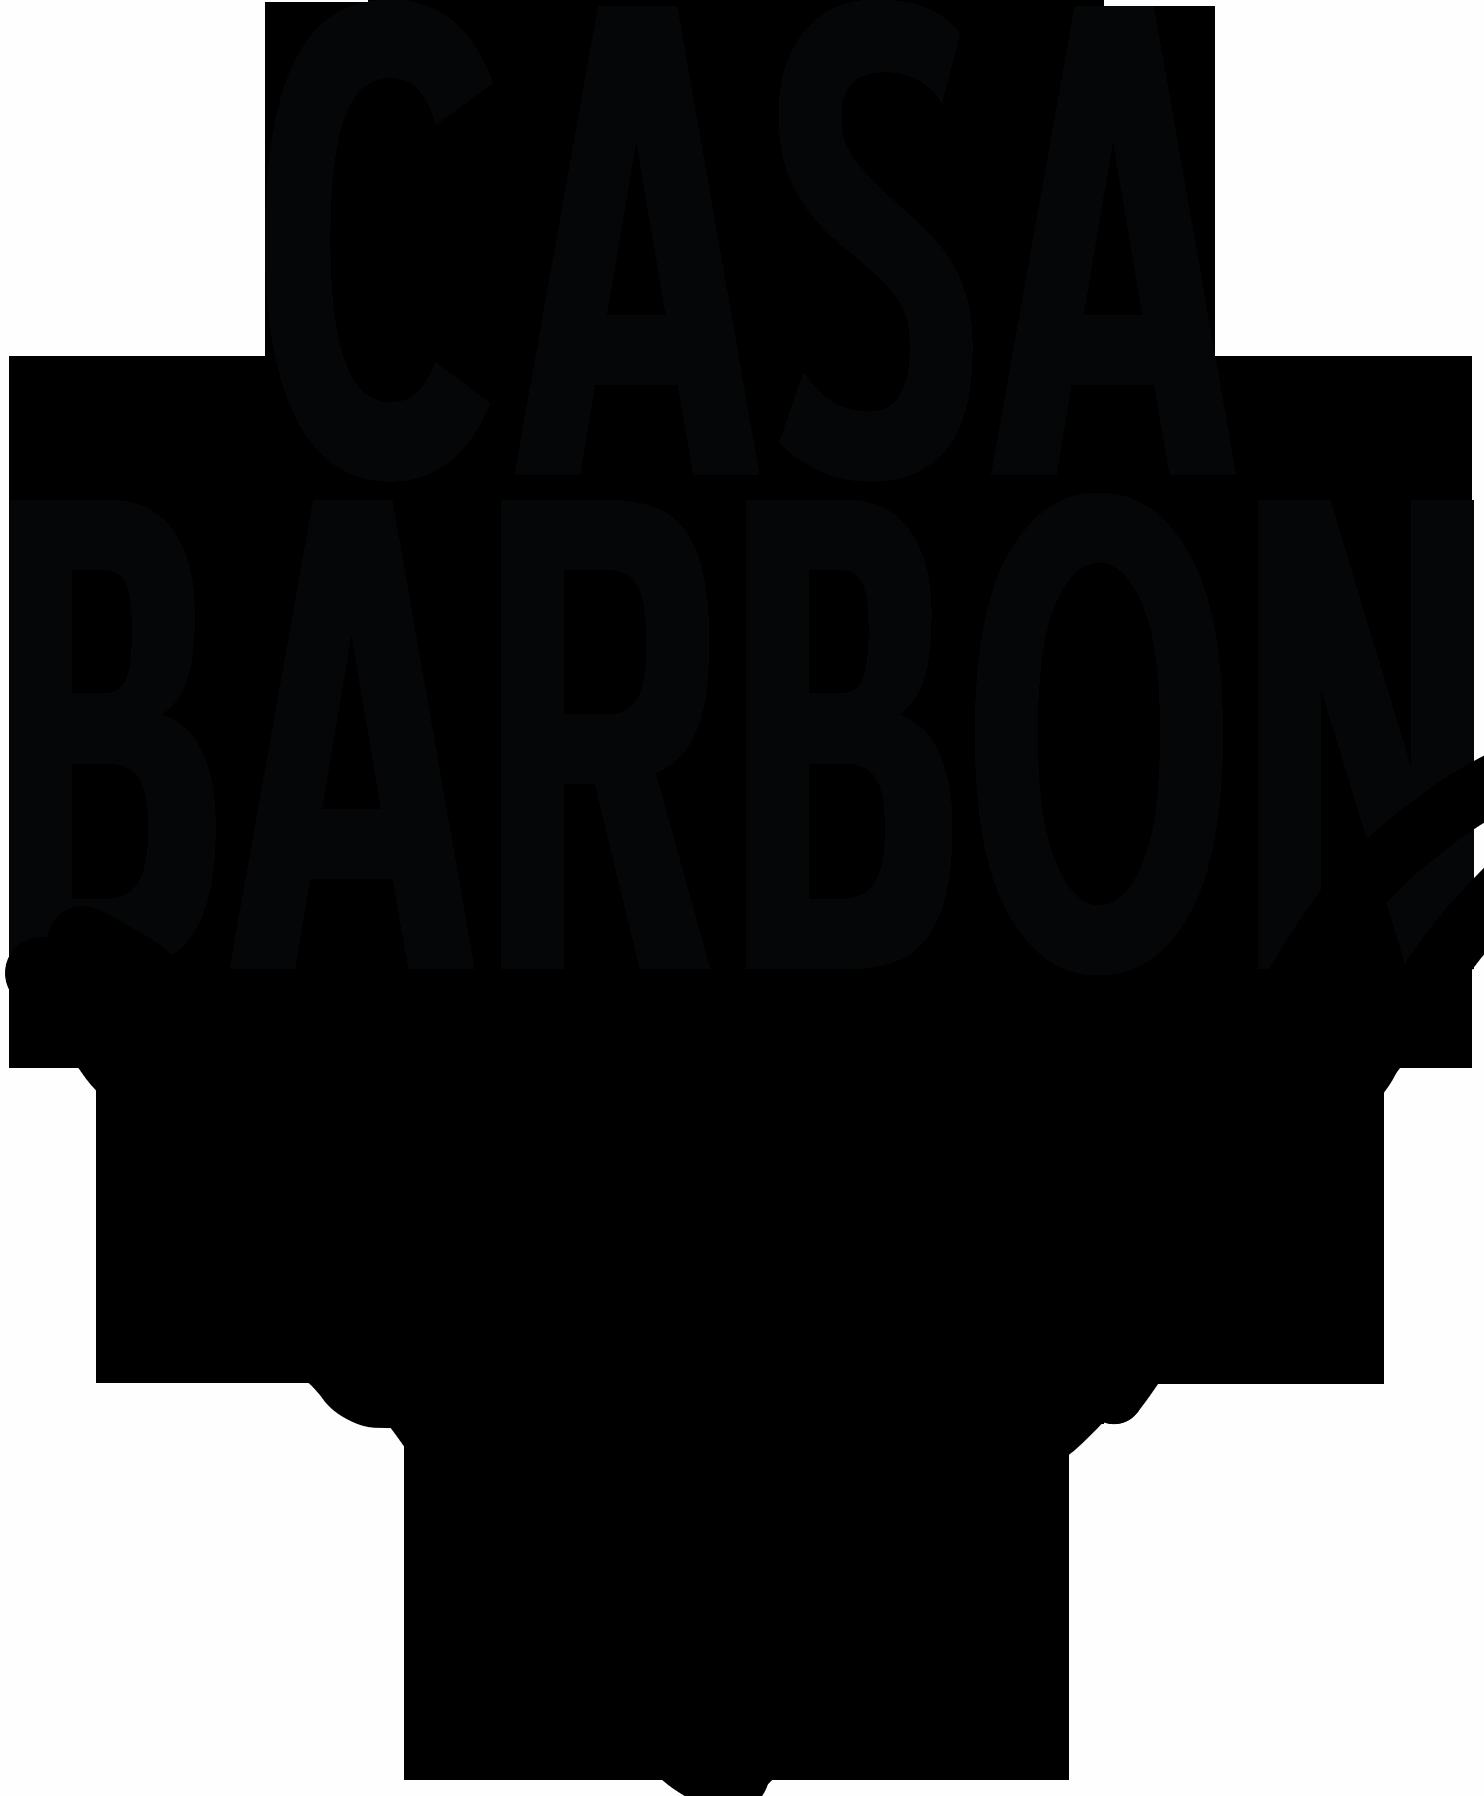 Location casa barbon. Neighborhood clipart town plaza